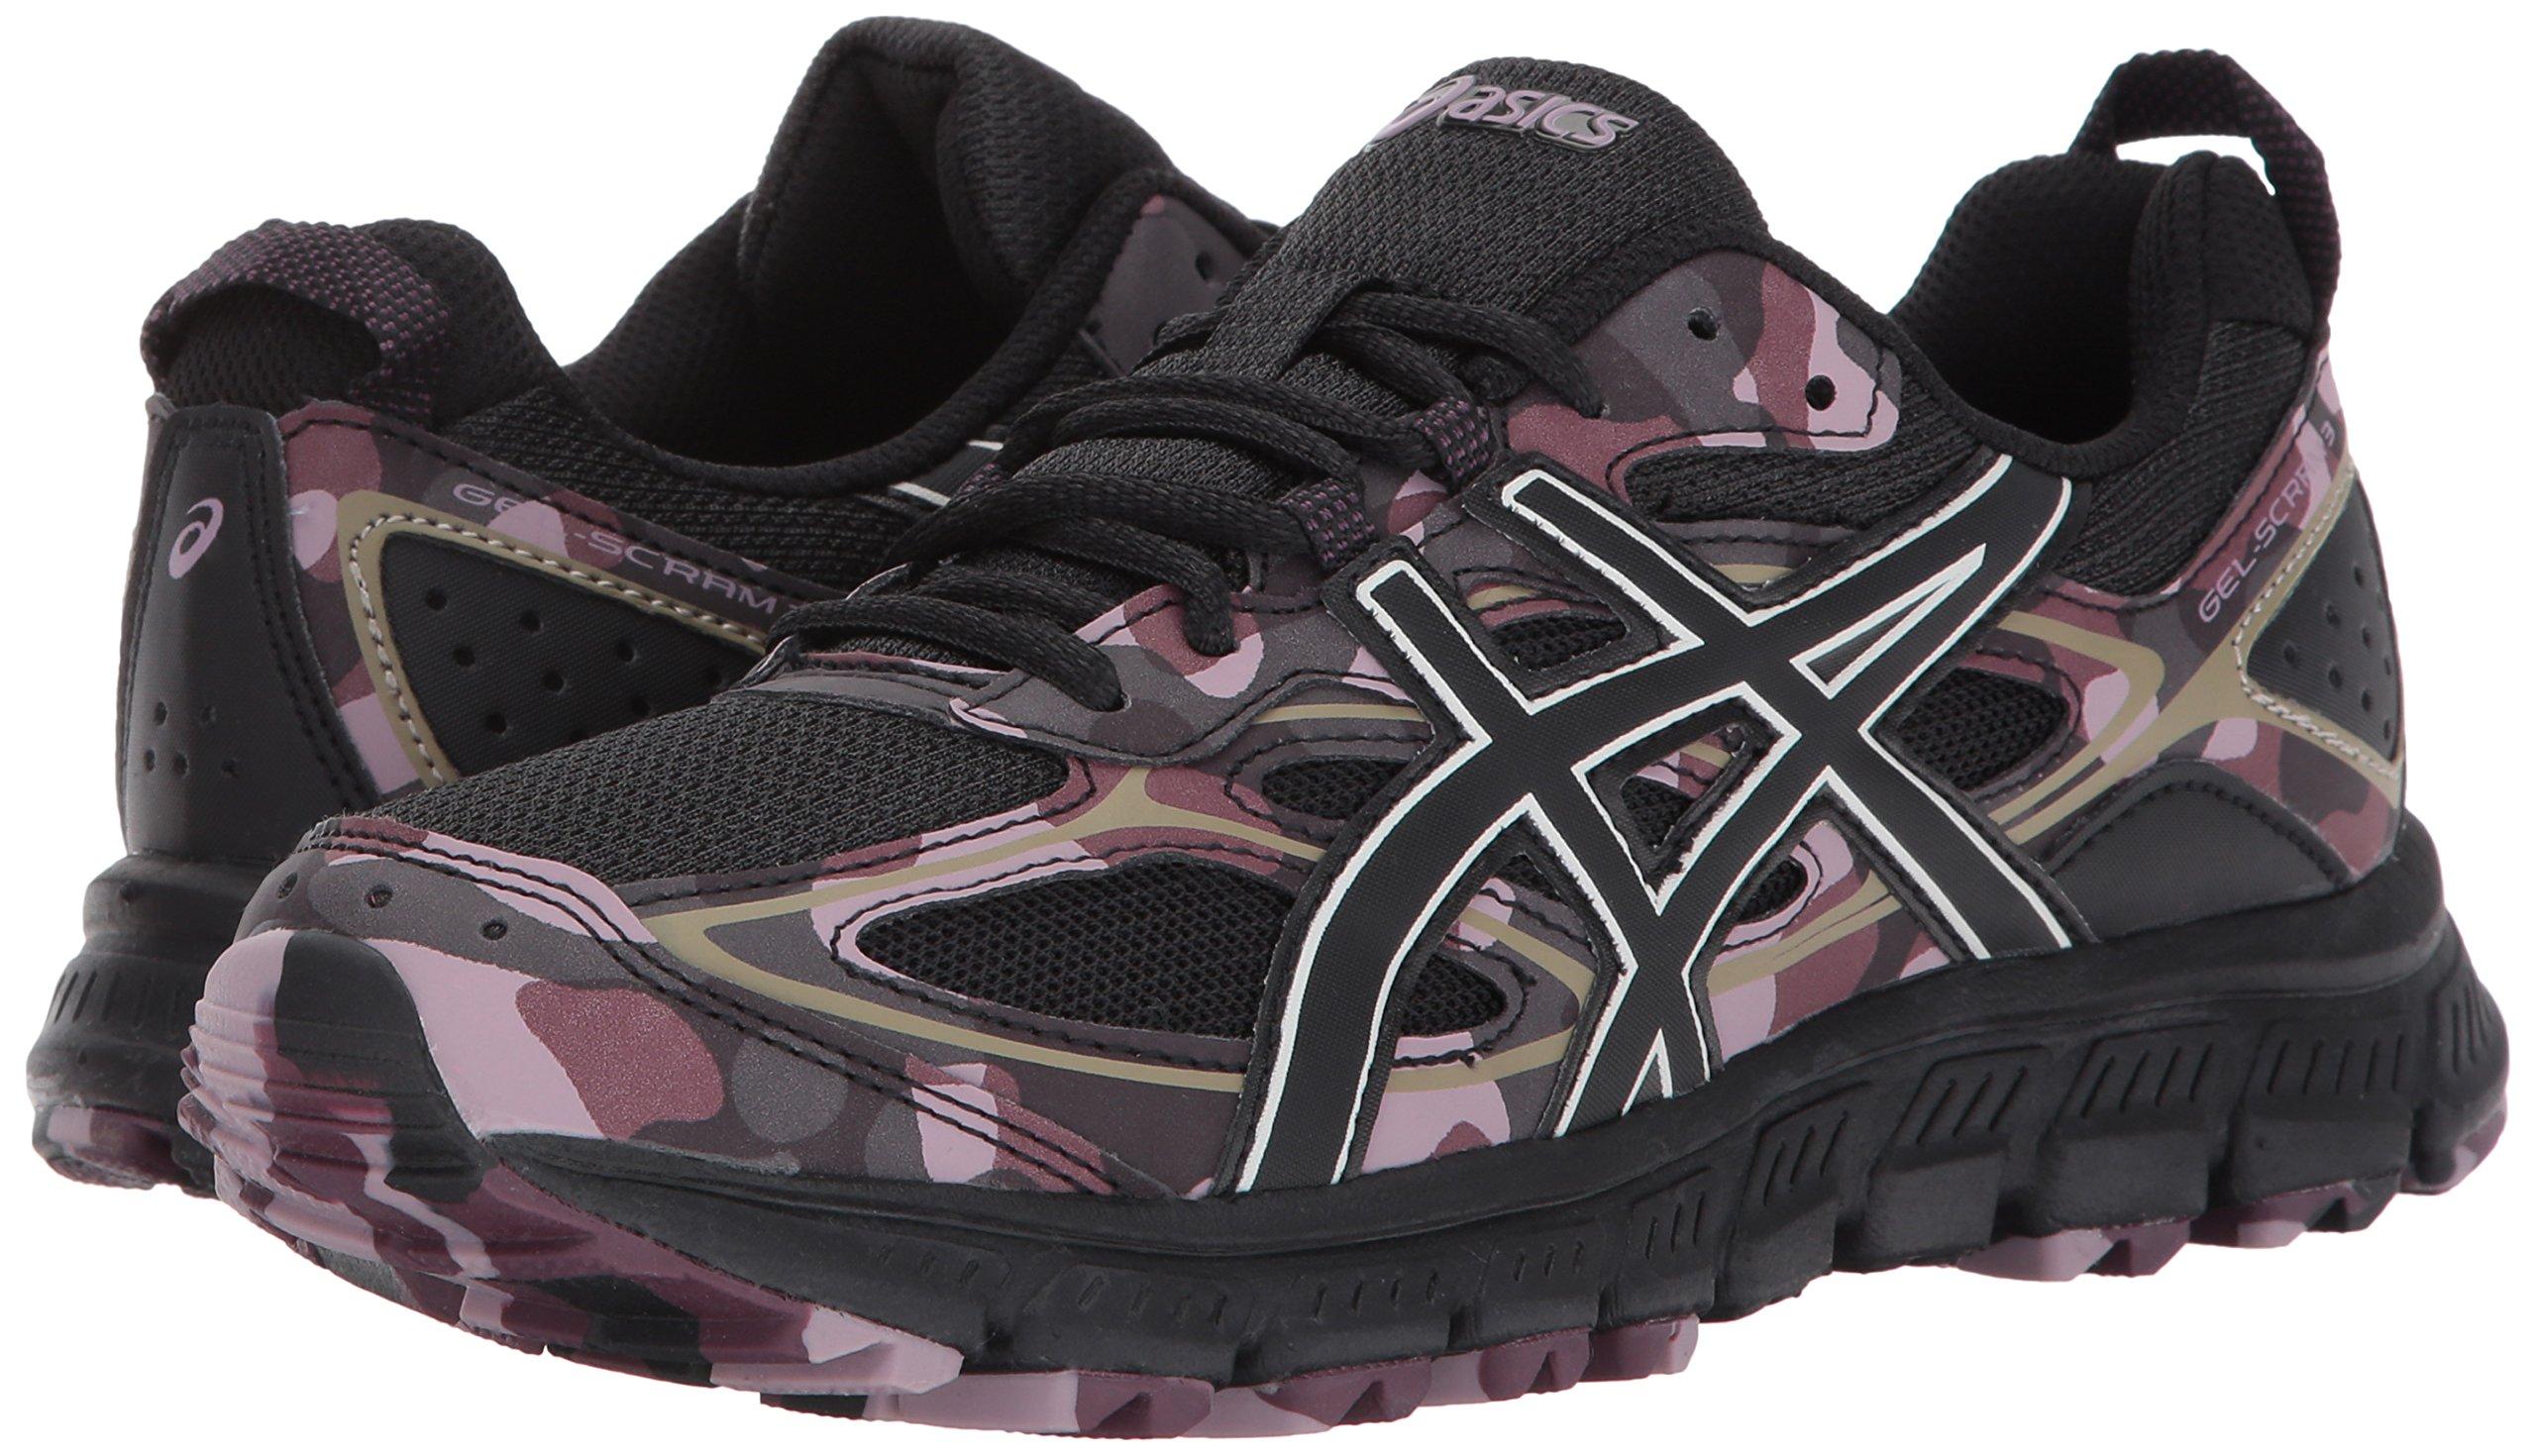 new styles 4d536 cb9a3 ASICS Womens Gel-Scram 3 Running Shoe, Phantom/Eggplant, 9.5 ...